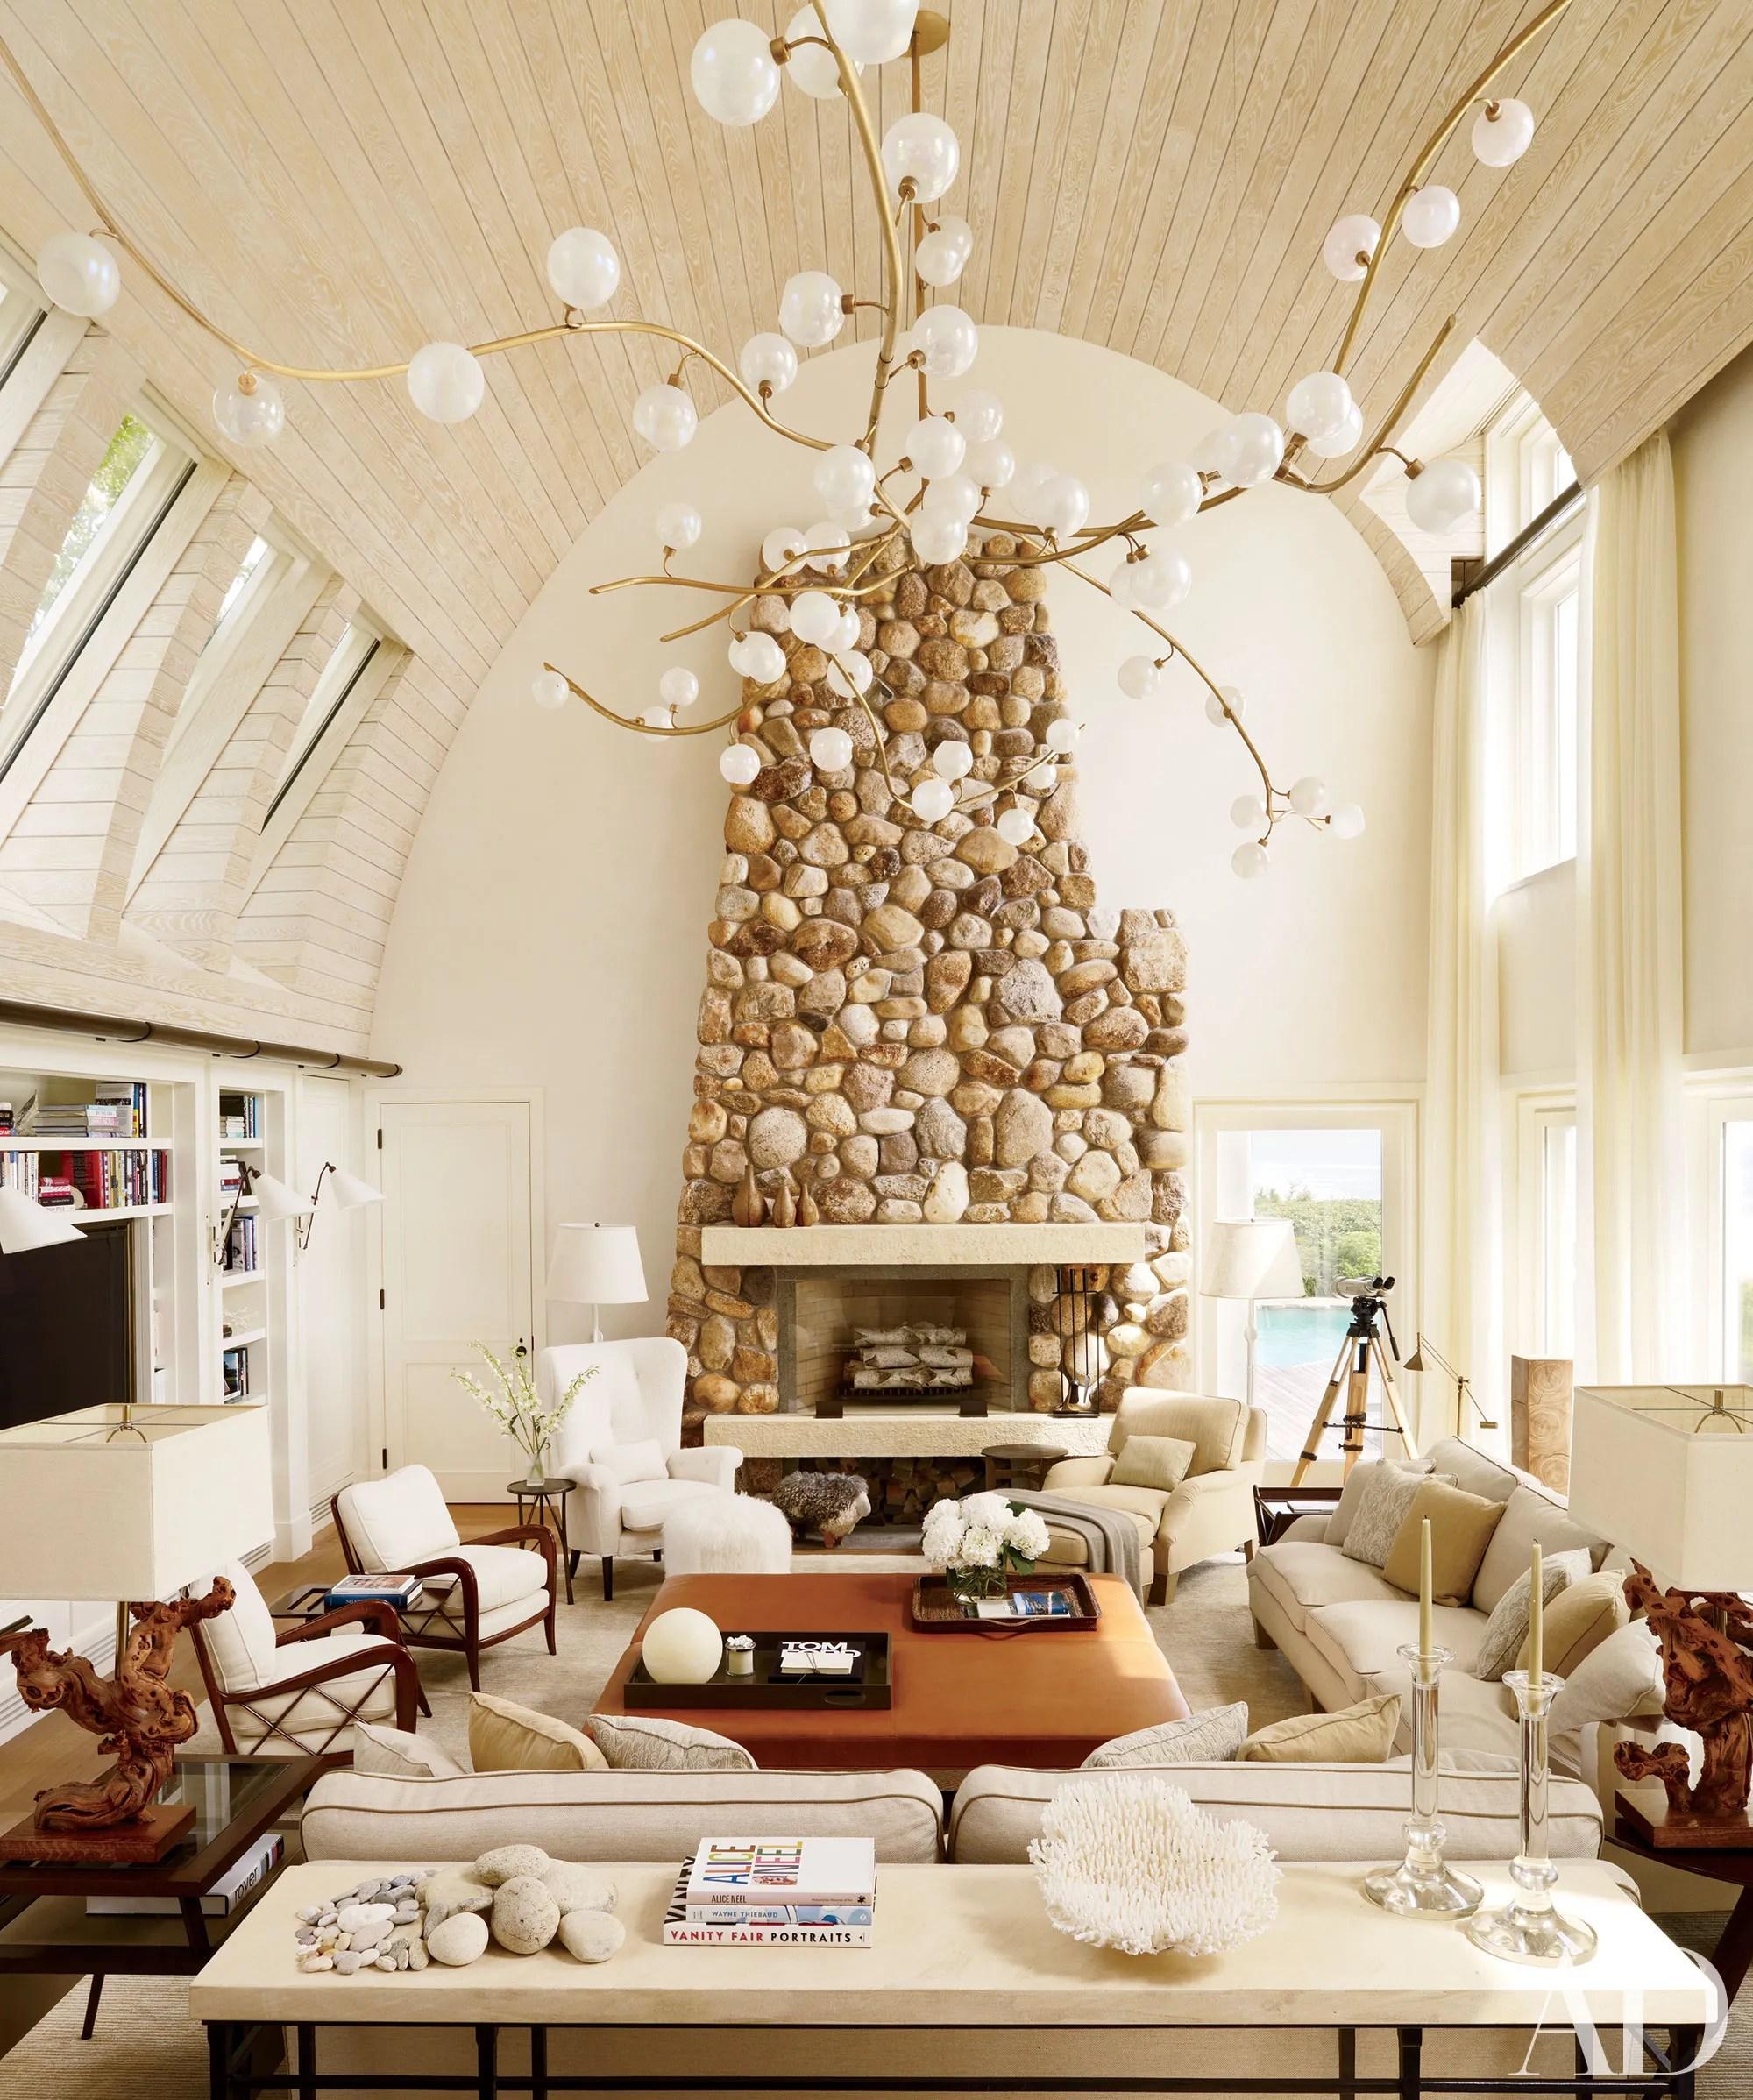 vaulted ceiling renovation inspiration